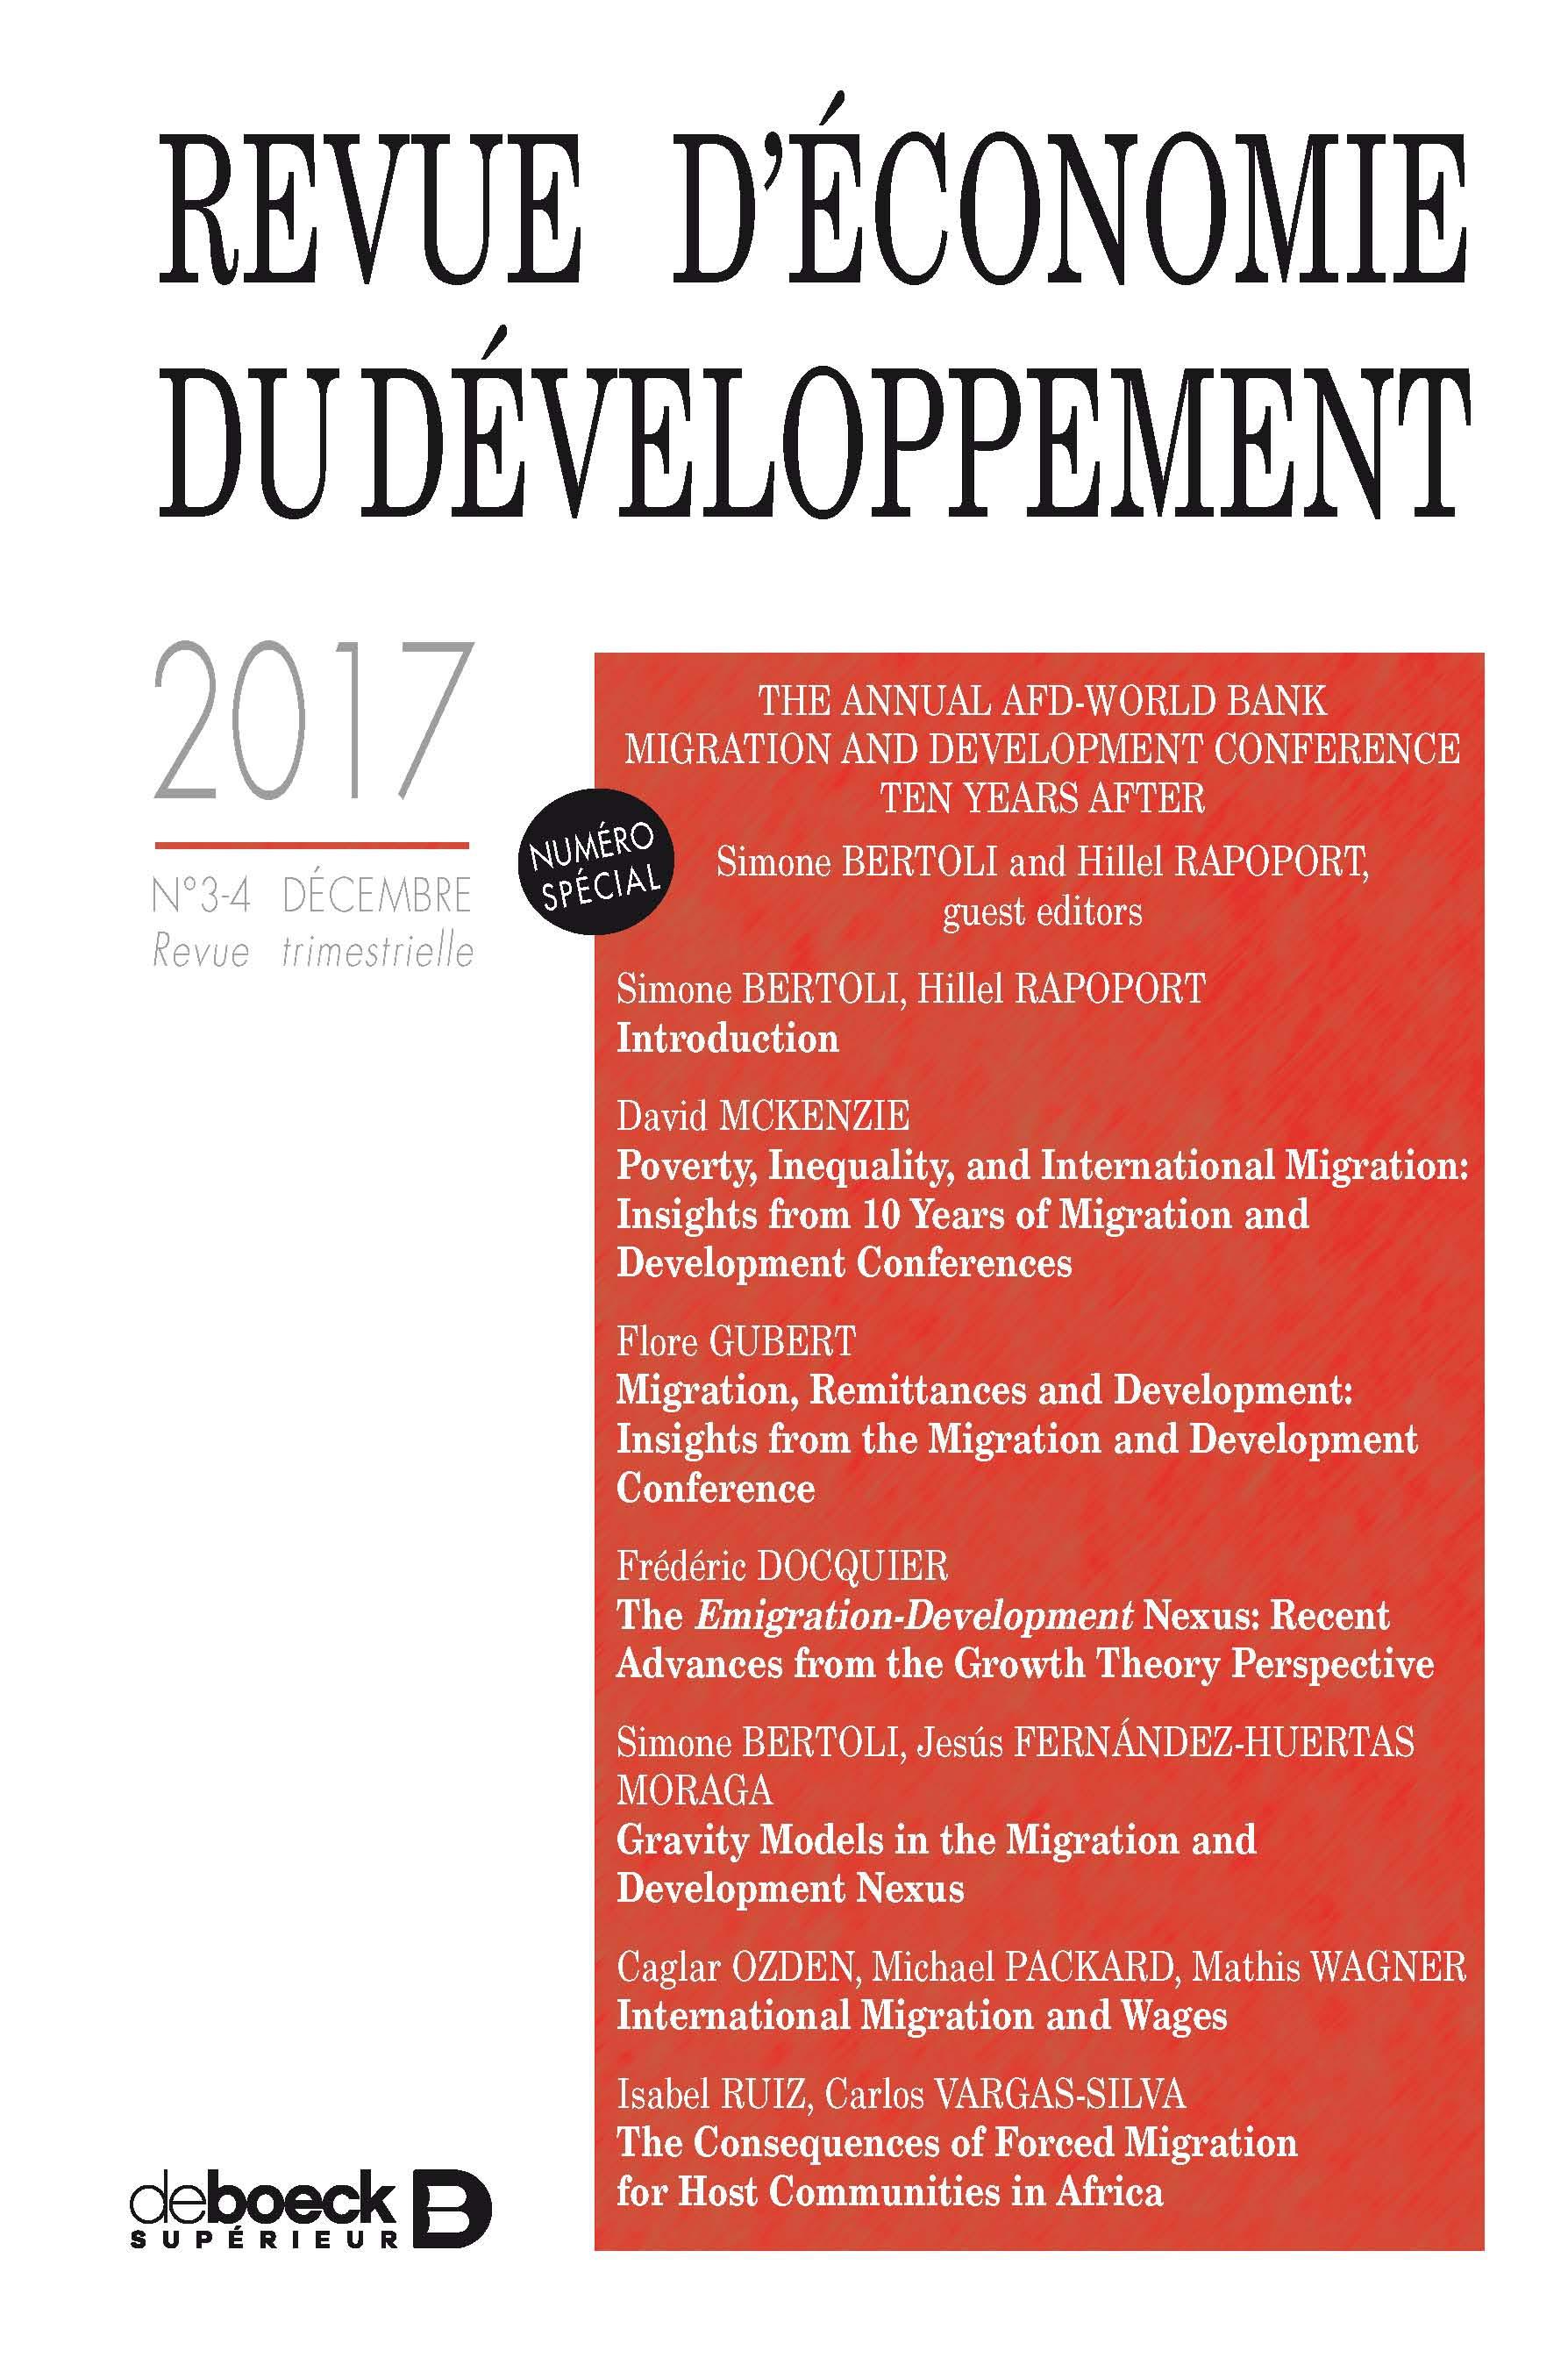 The Emigration-Development Nexus: Recent Advances from the Growth